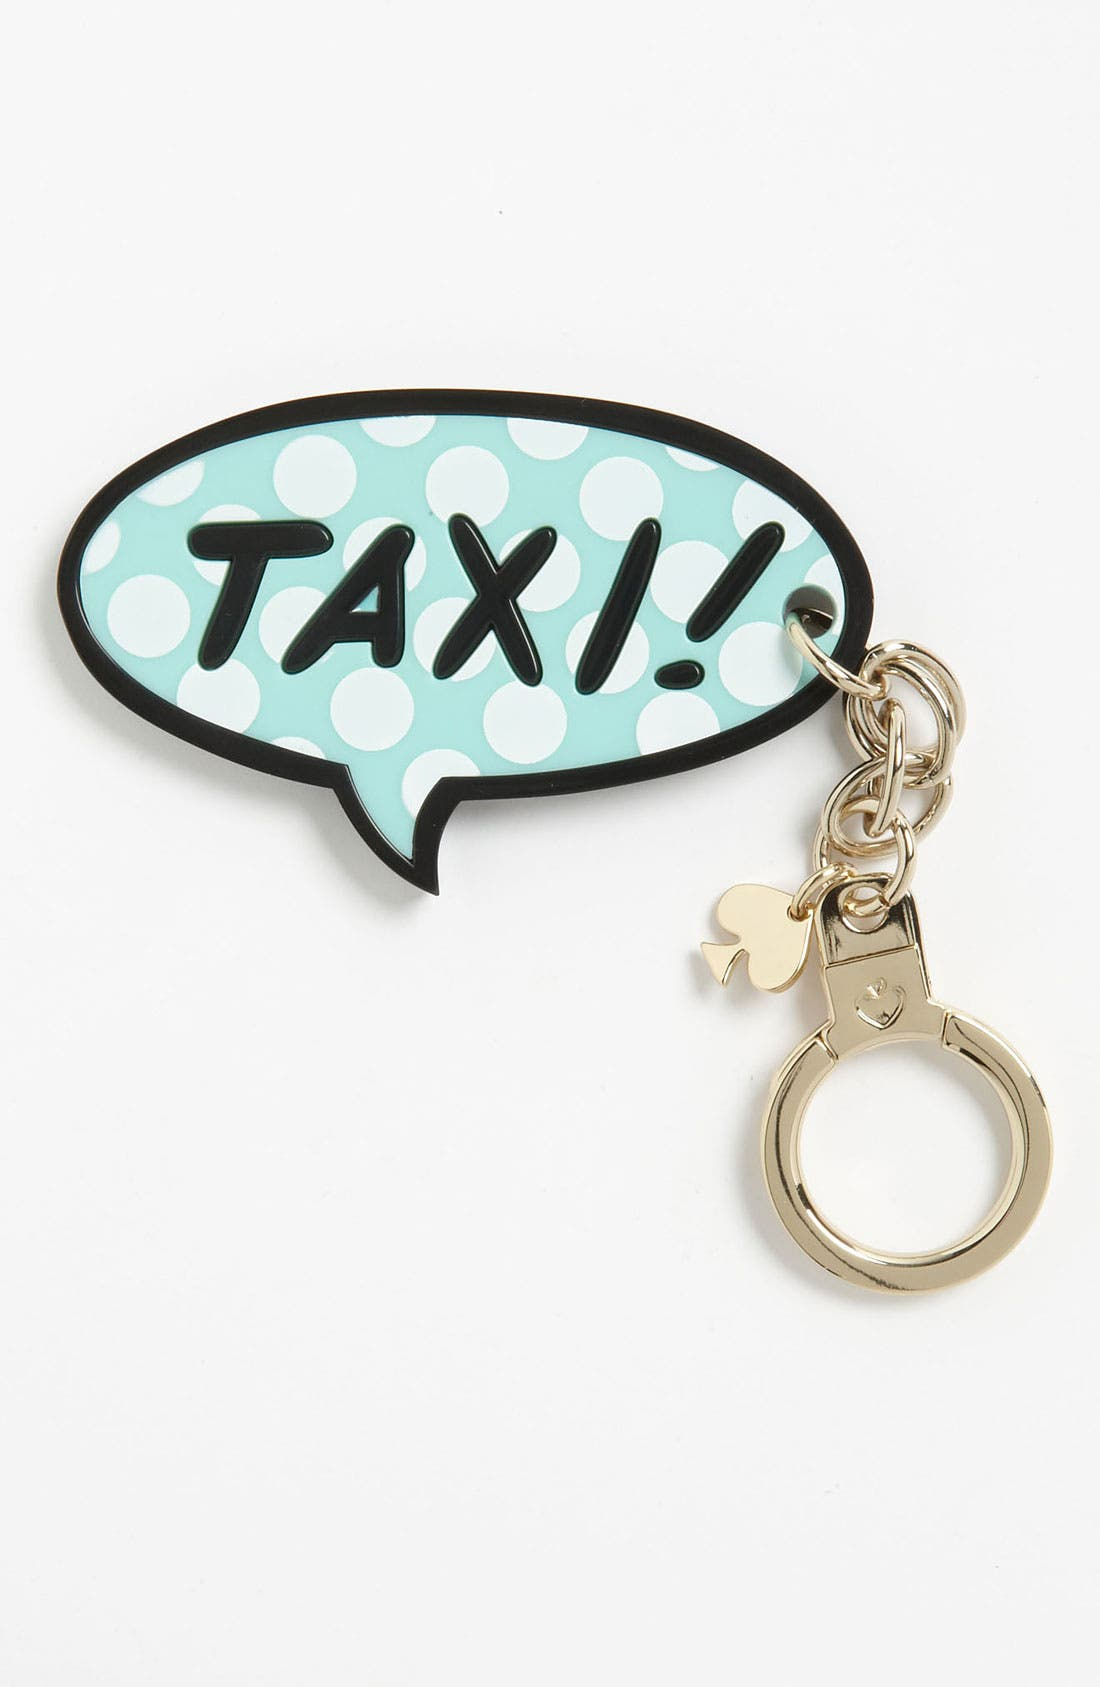 Main Image - kate spade new york 'taxi' key ring